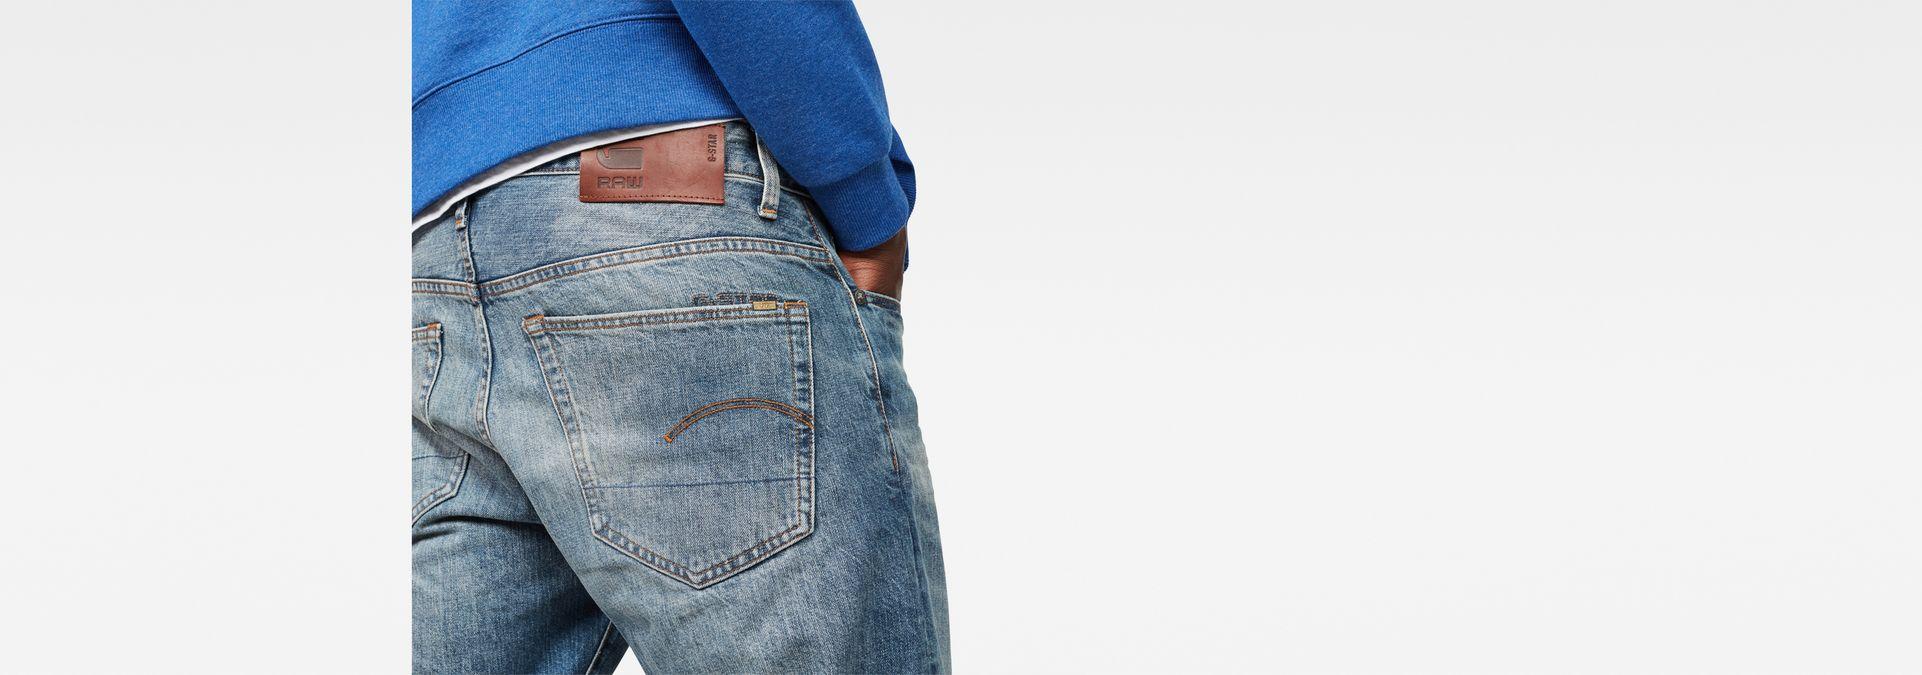 3301 tapered jeans medium aged men sale g star raw. Black Bedroom Furniture Sets. Home Design Ideas